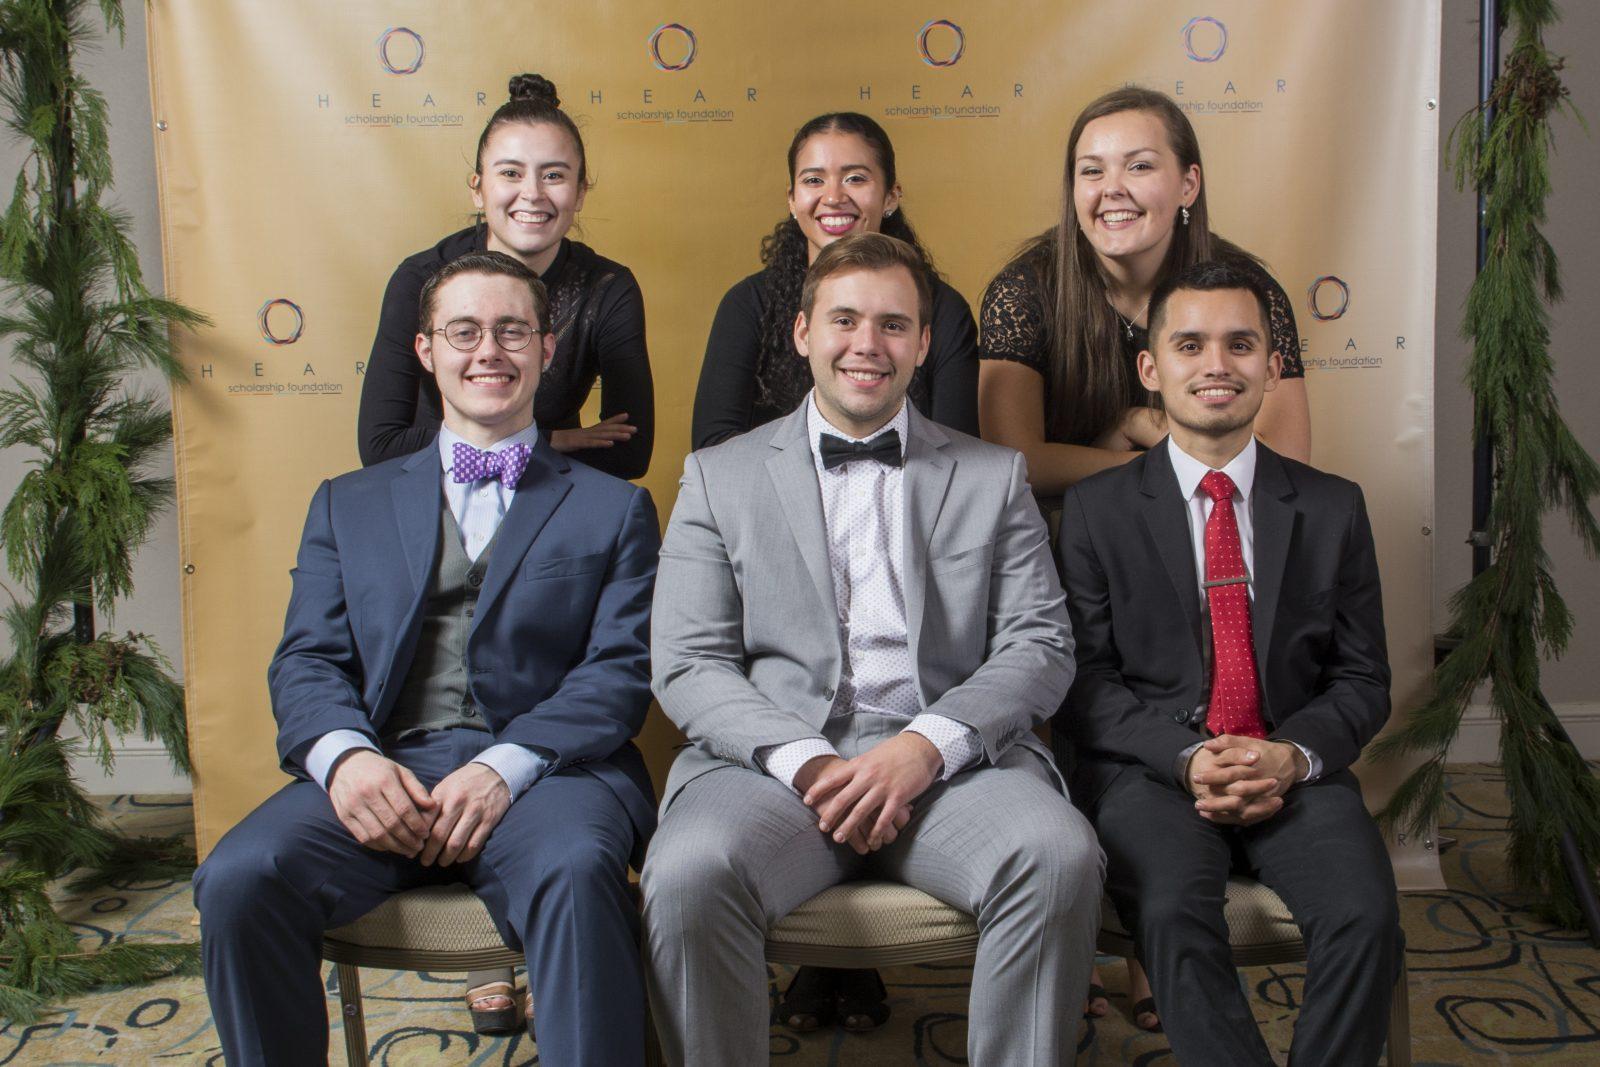 HEAR Scholars at the 2016 HEAR Holiday Fundraiser.